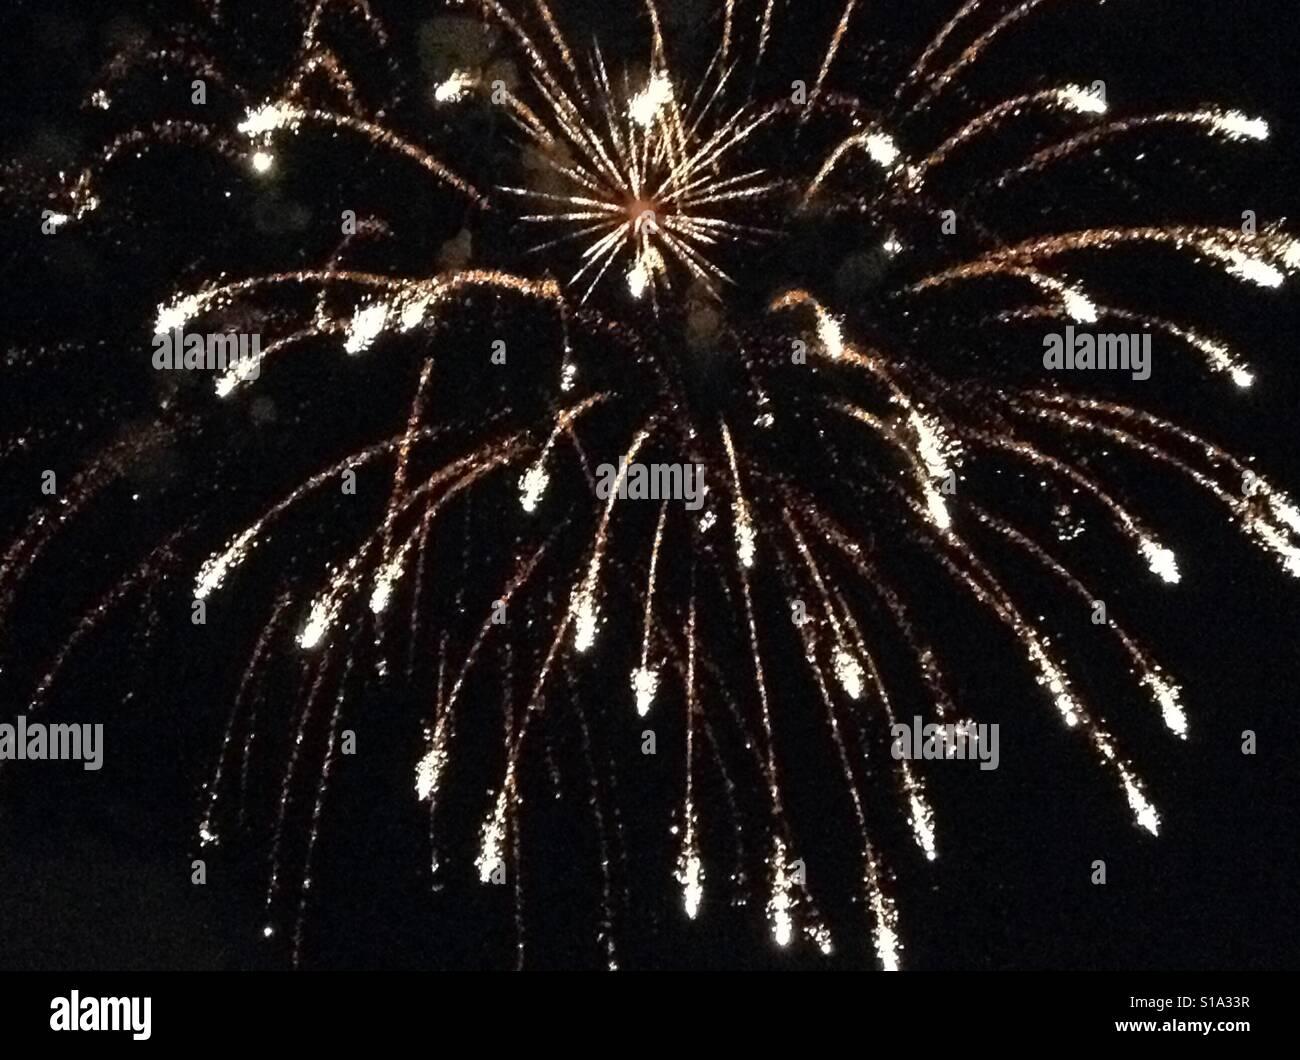 Bursting fireworks at night - Stock Image